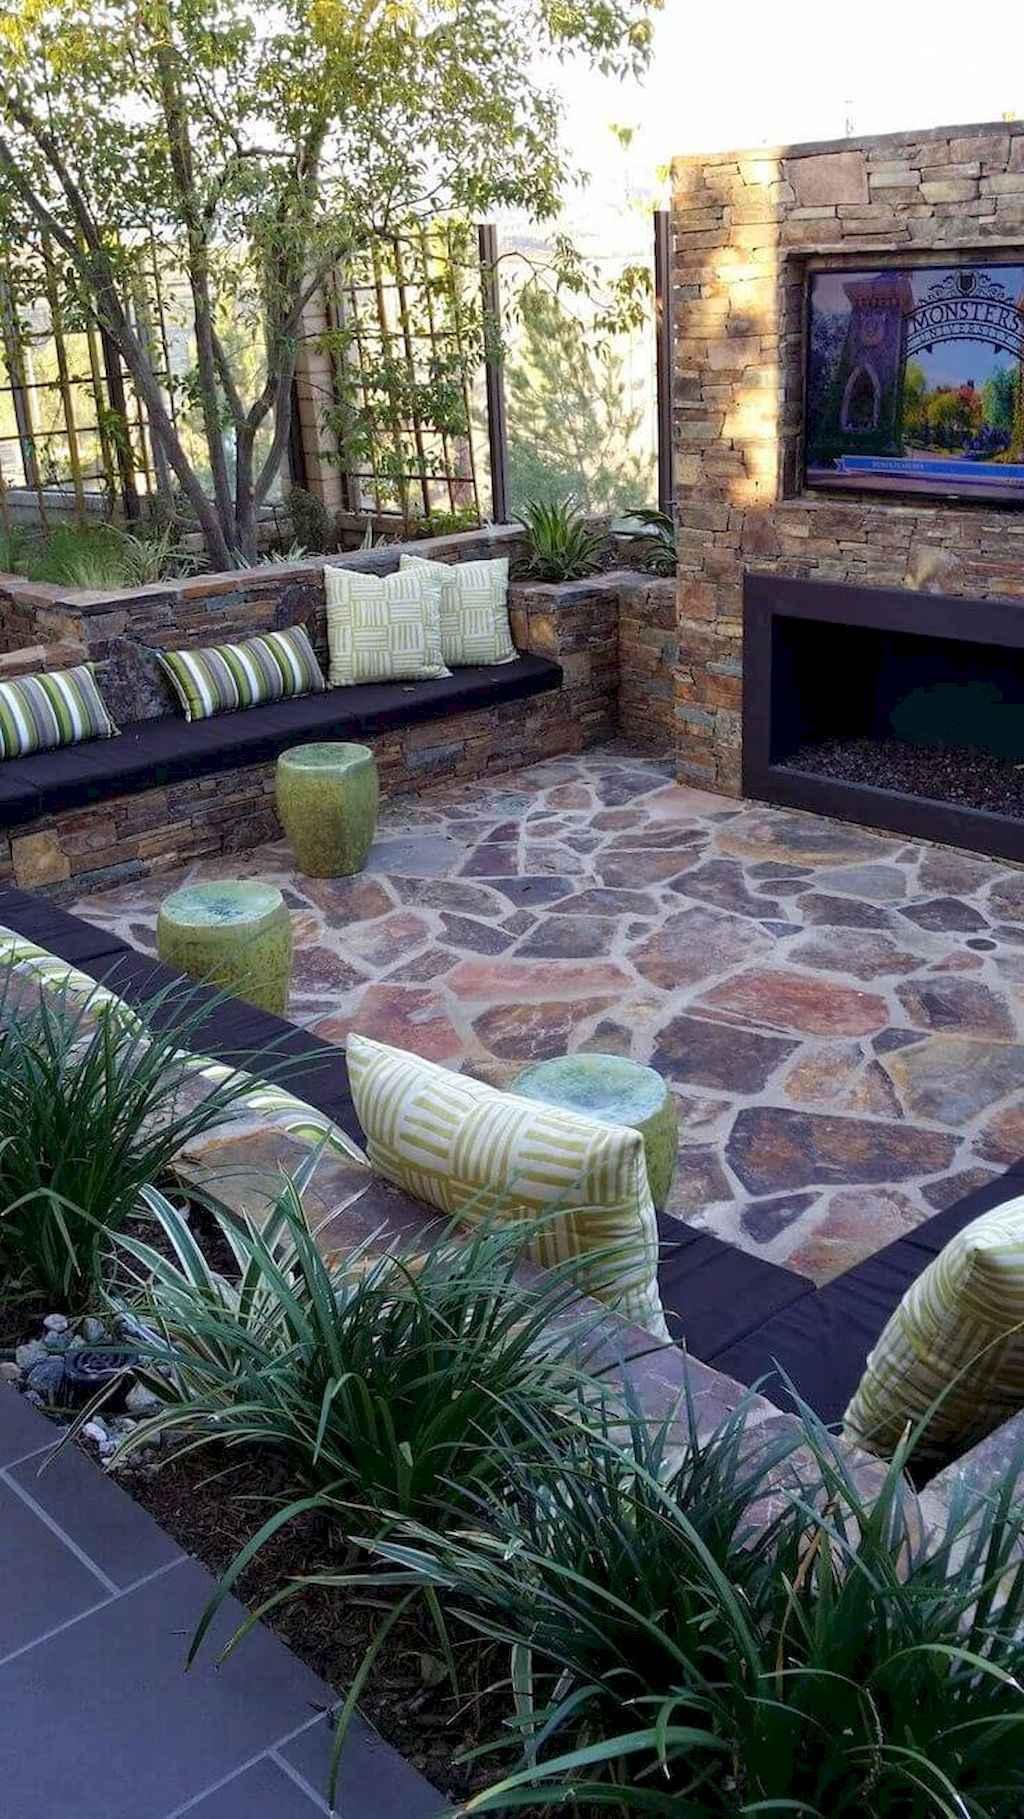 Amazing small backyard ideas 52 for Small yard decorating ideas